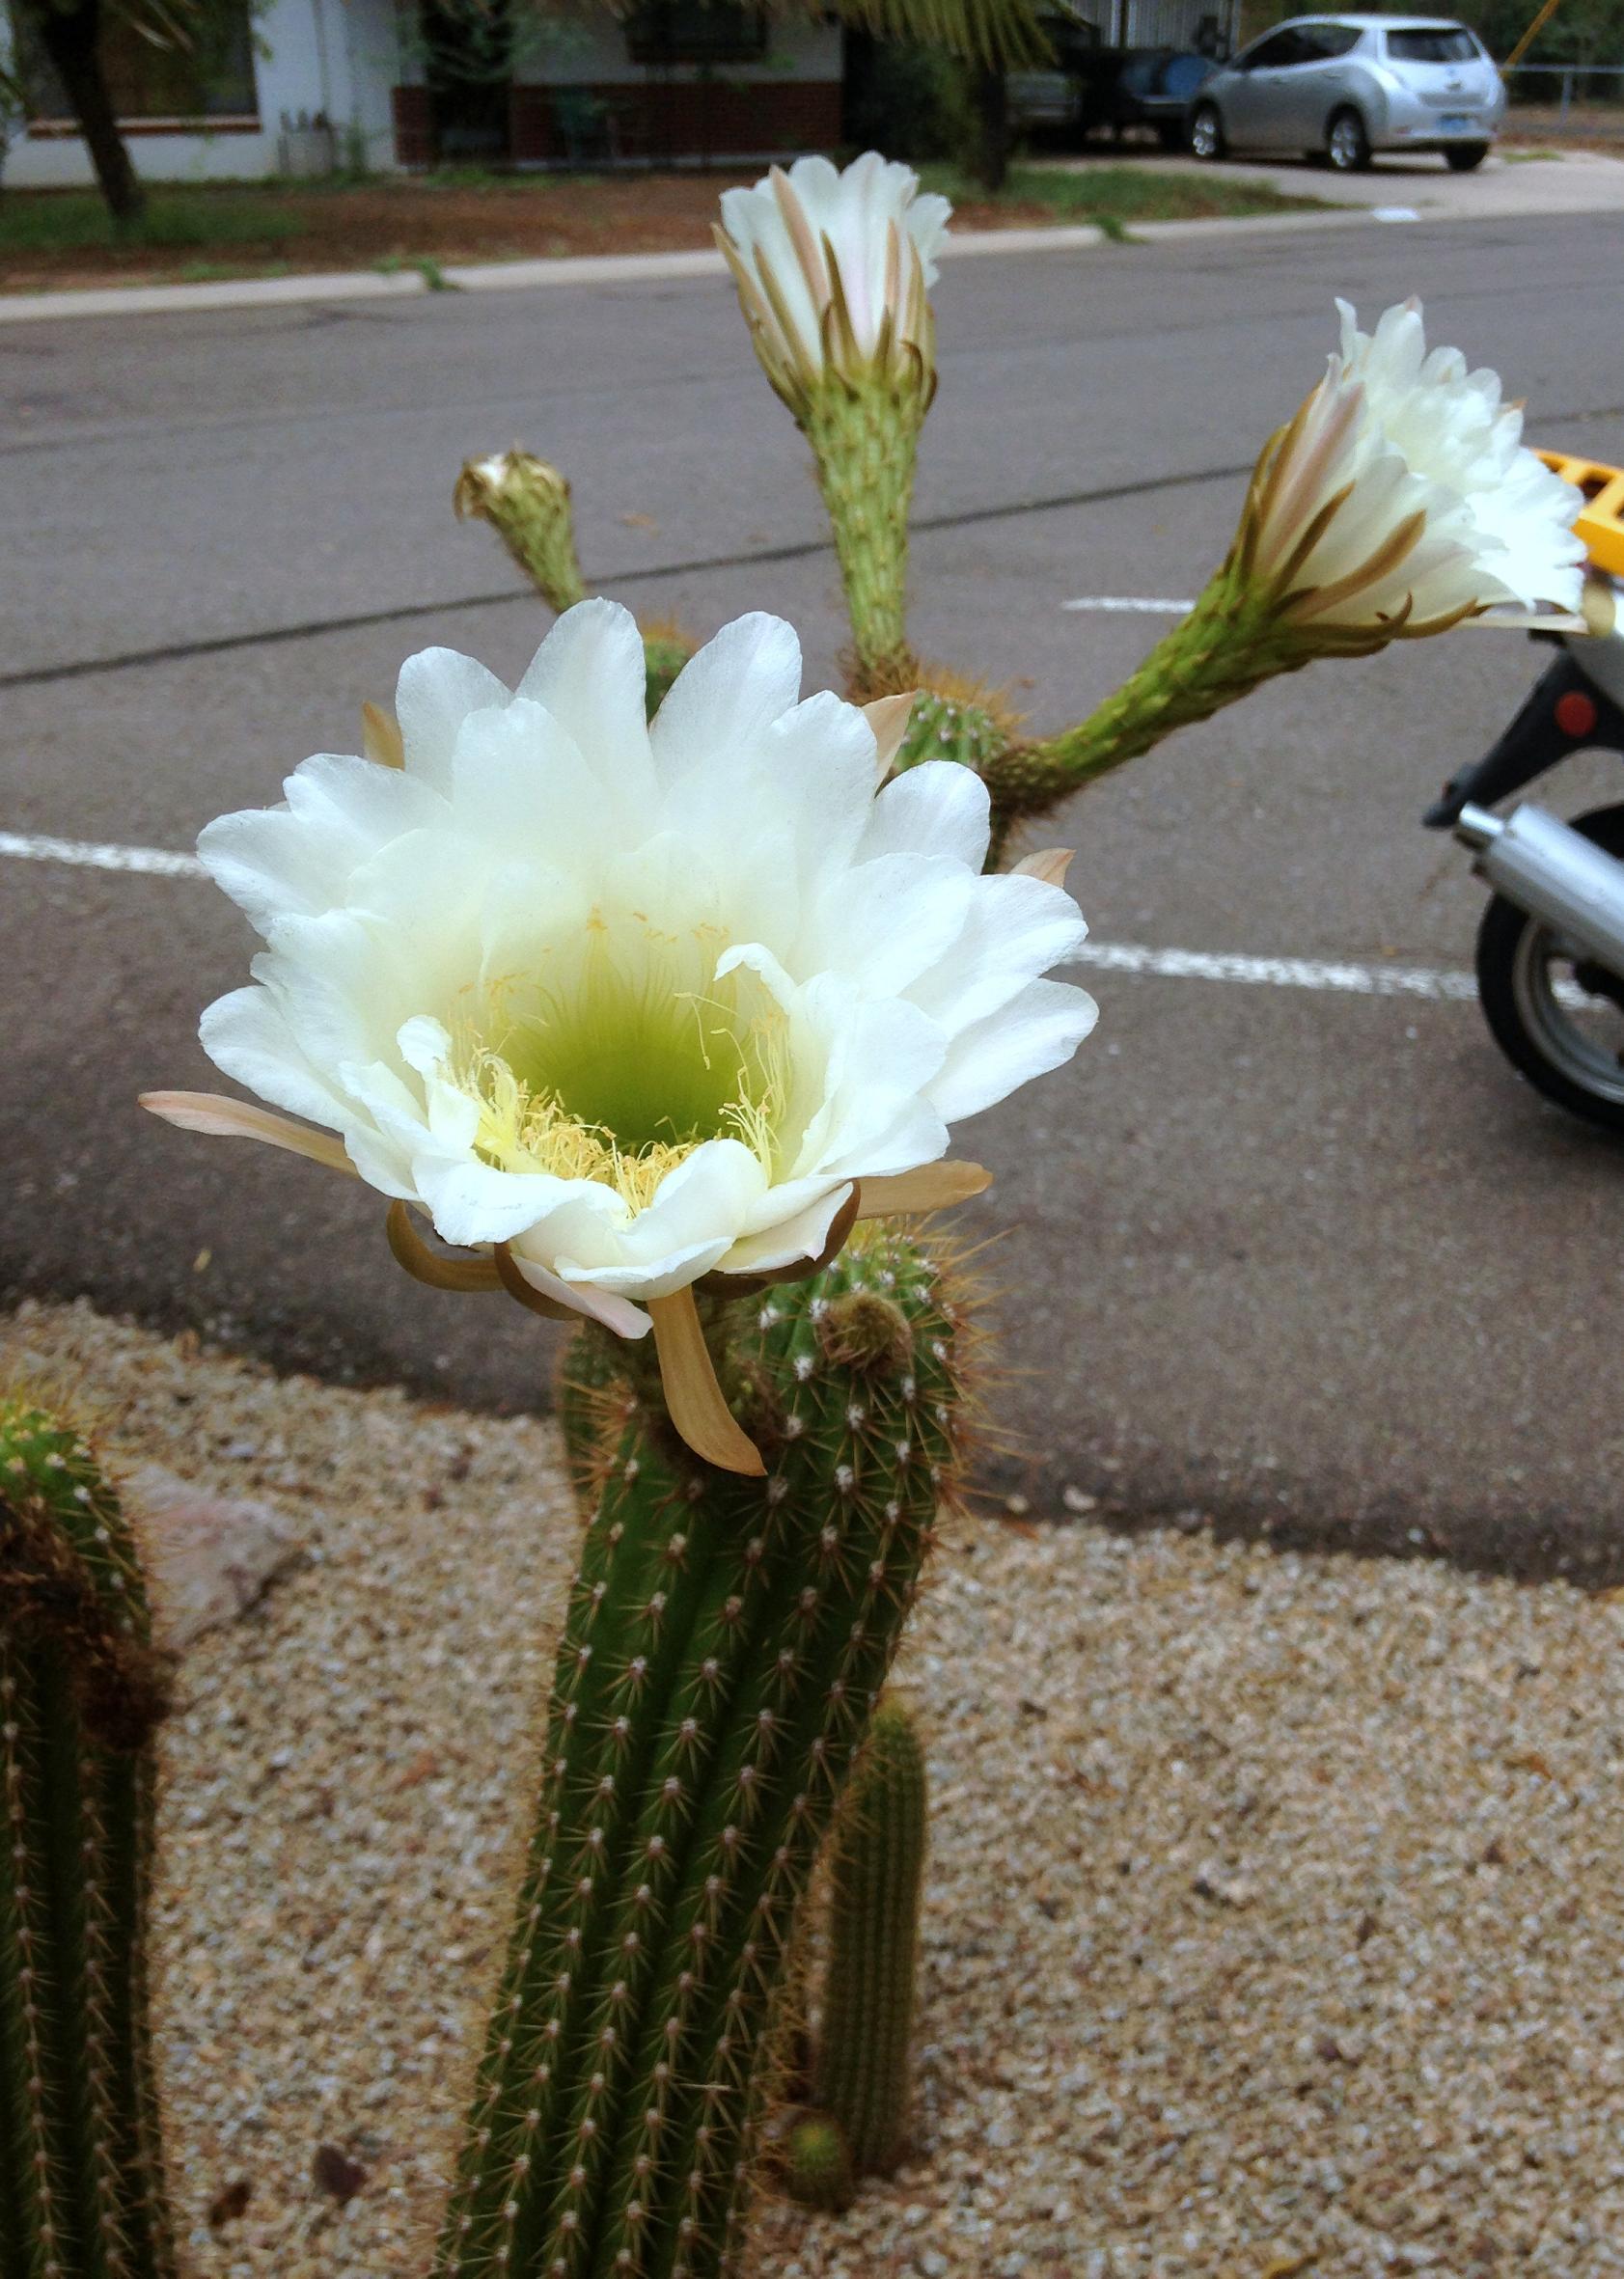 mantis and cactus flower 4